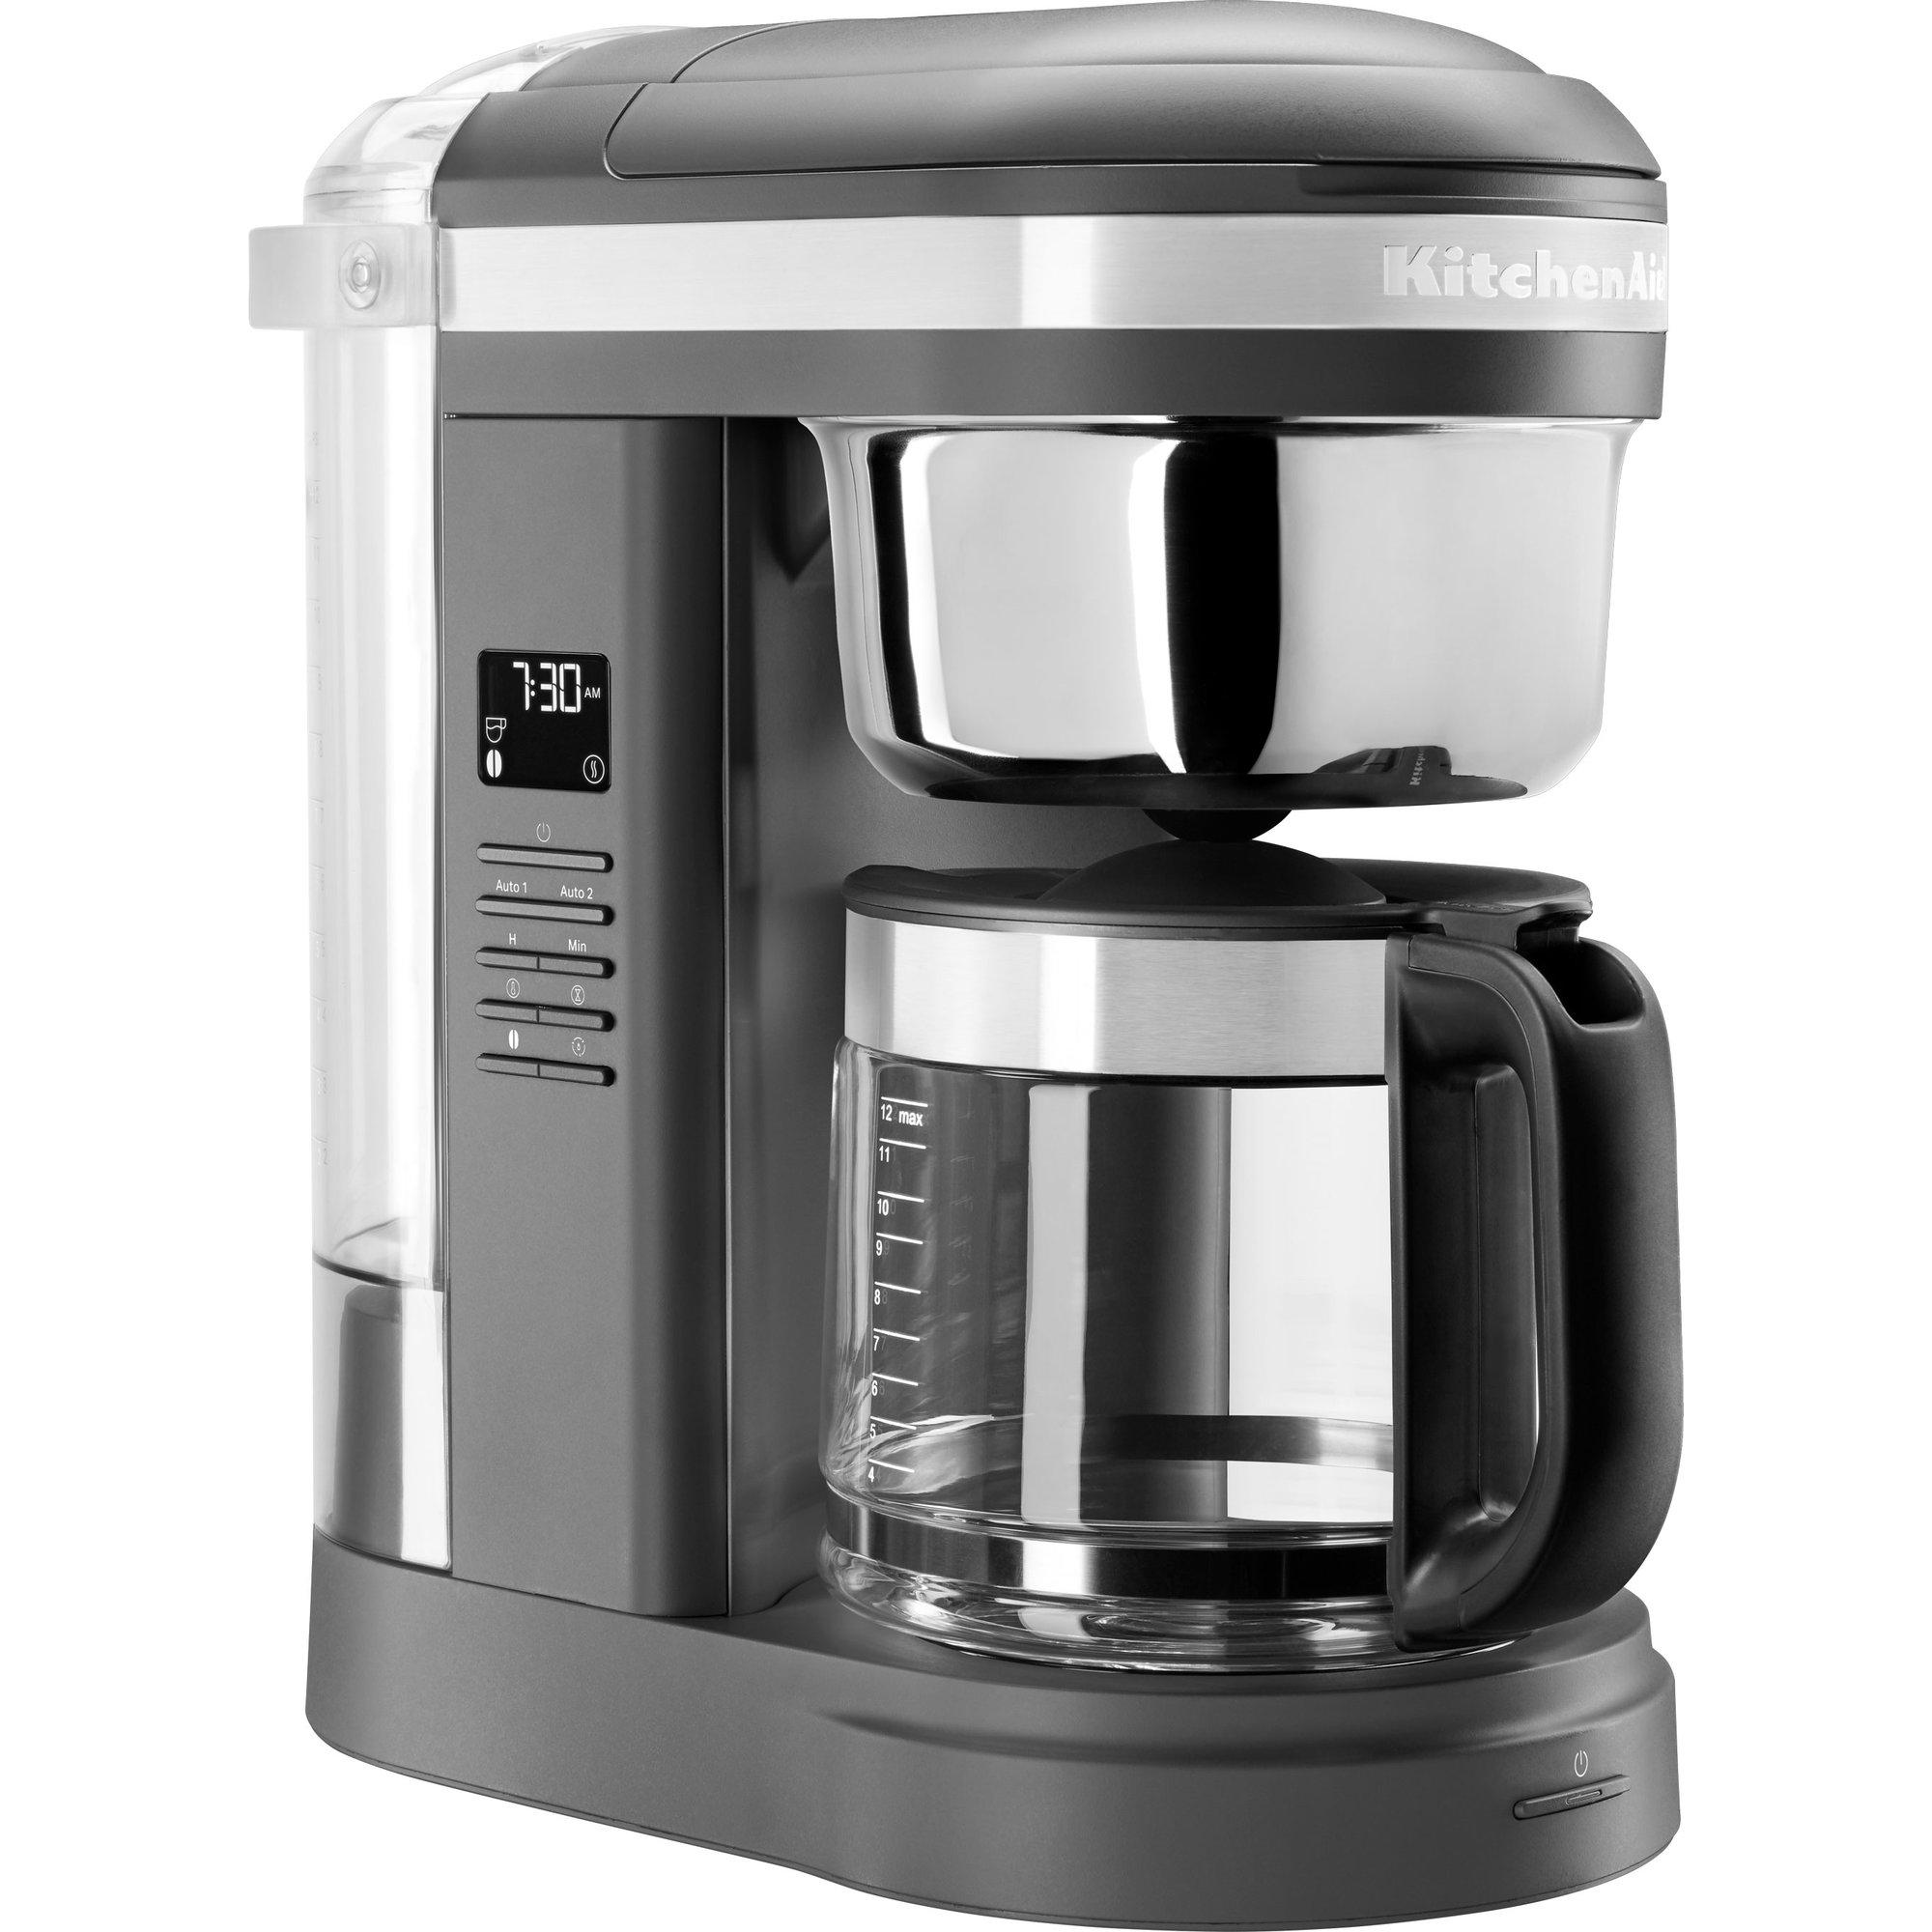 KitchenAid 5KCM1209EDG kaffebryggare Charcoal